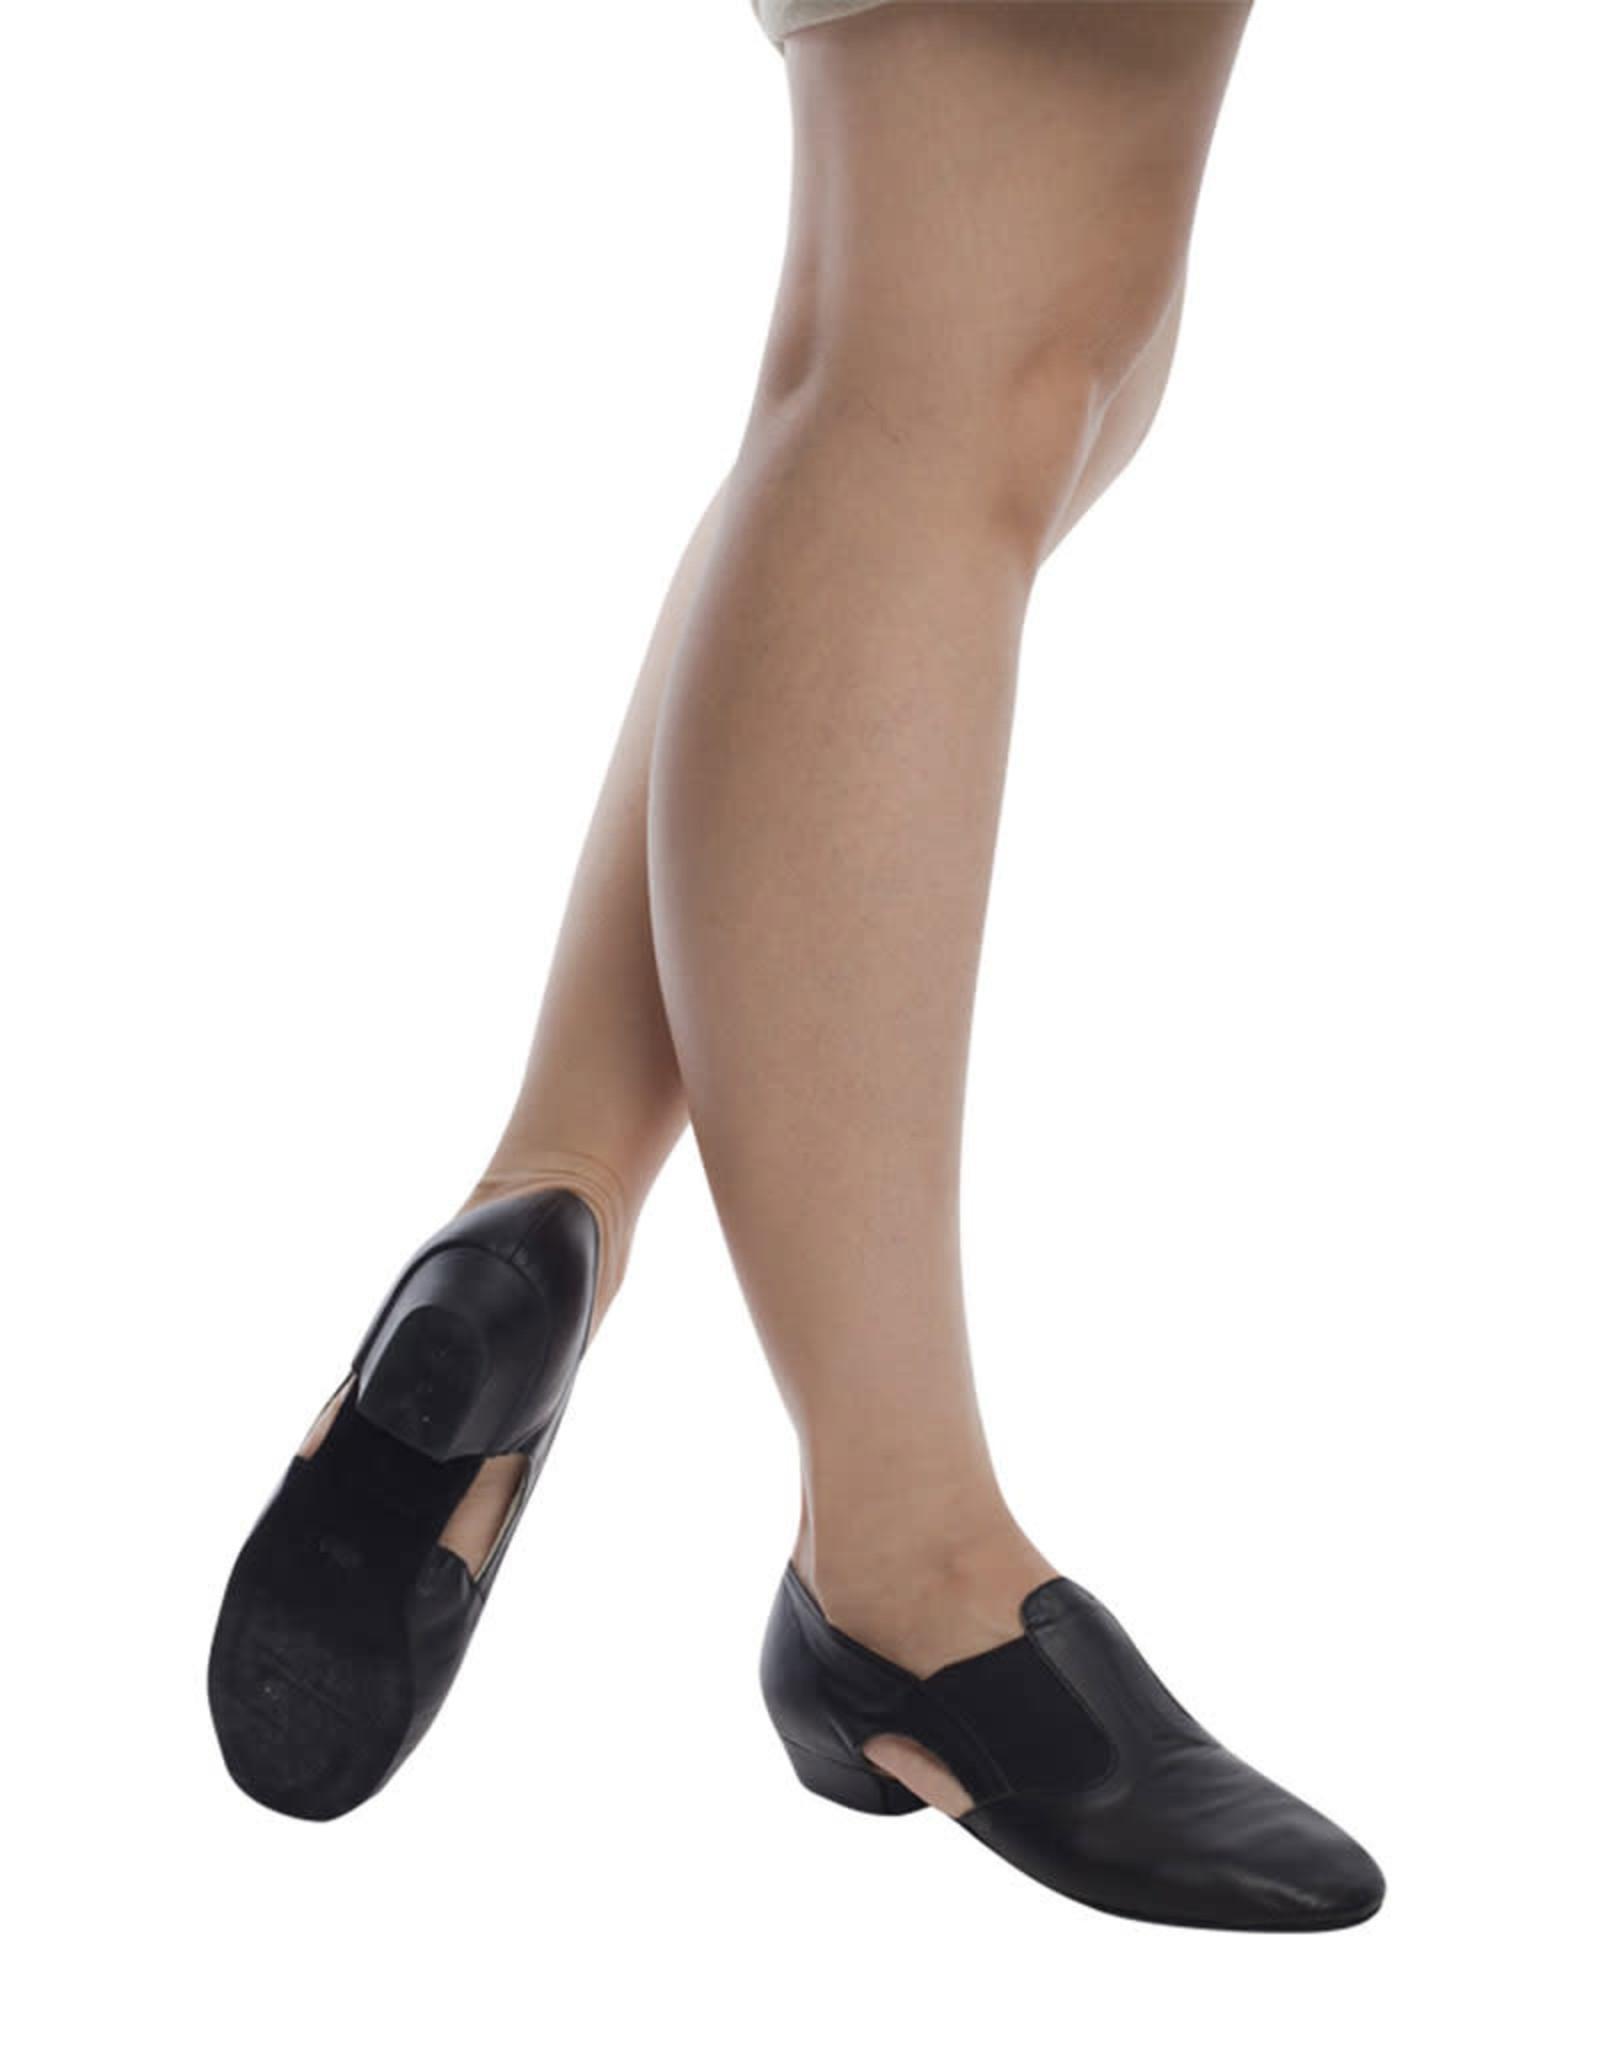 Sansha Magnifica Shoes TE/Lco